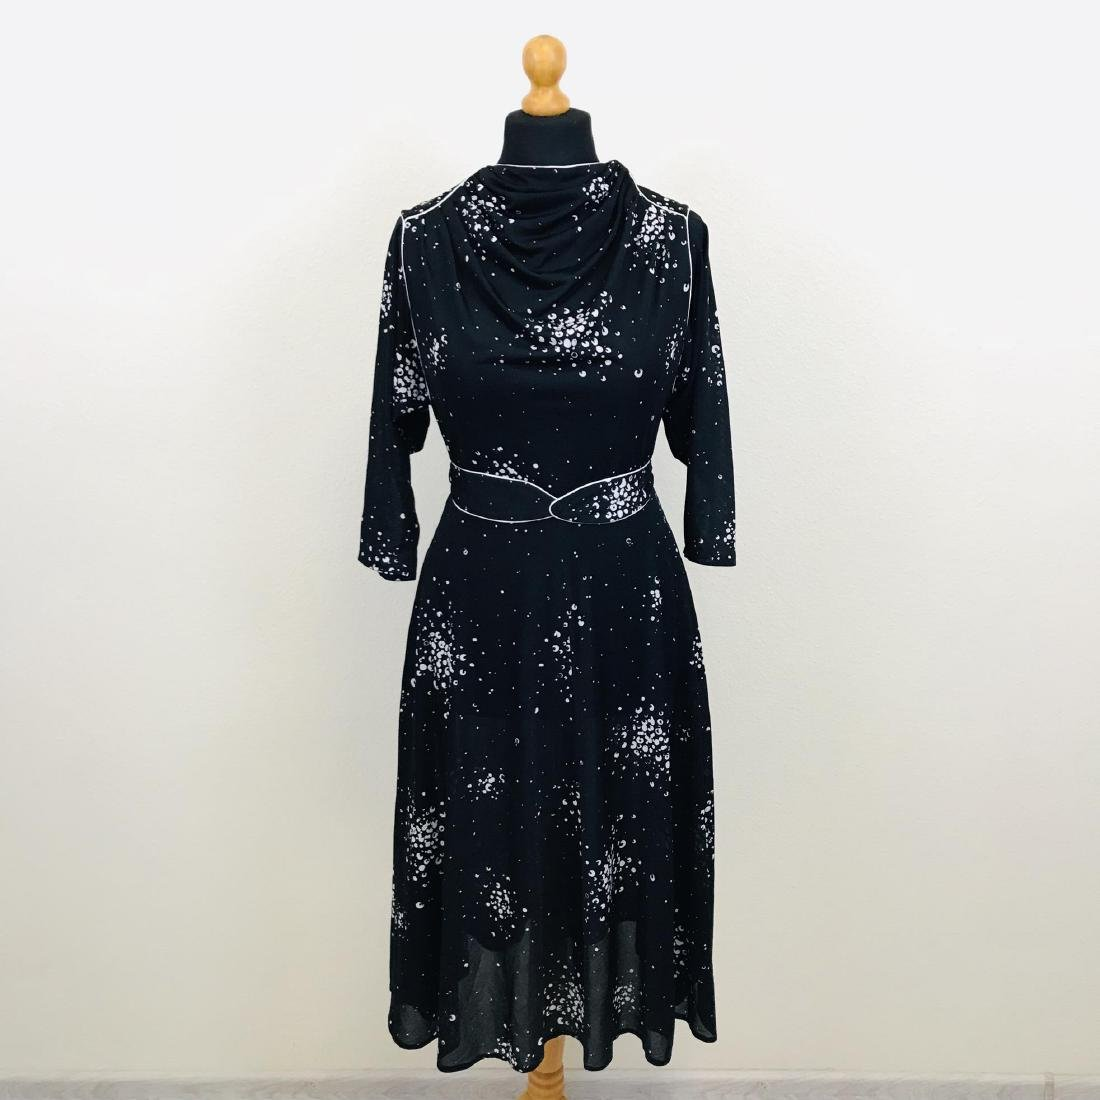 Vintage Women's Evening Dress